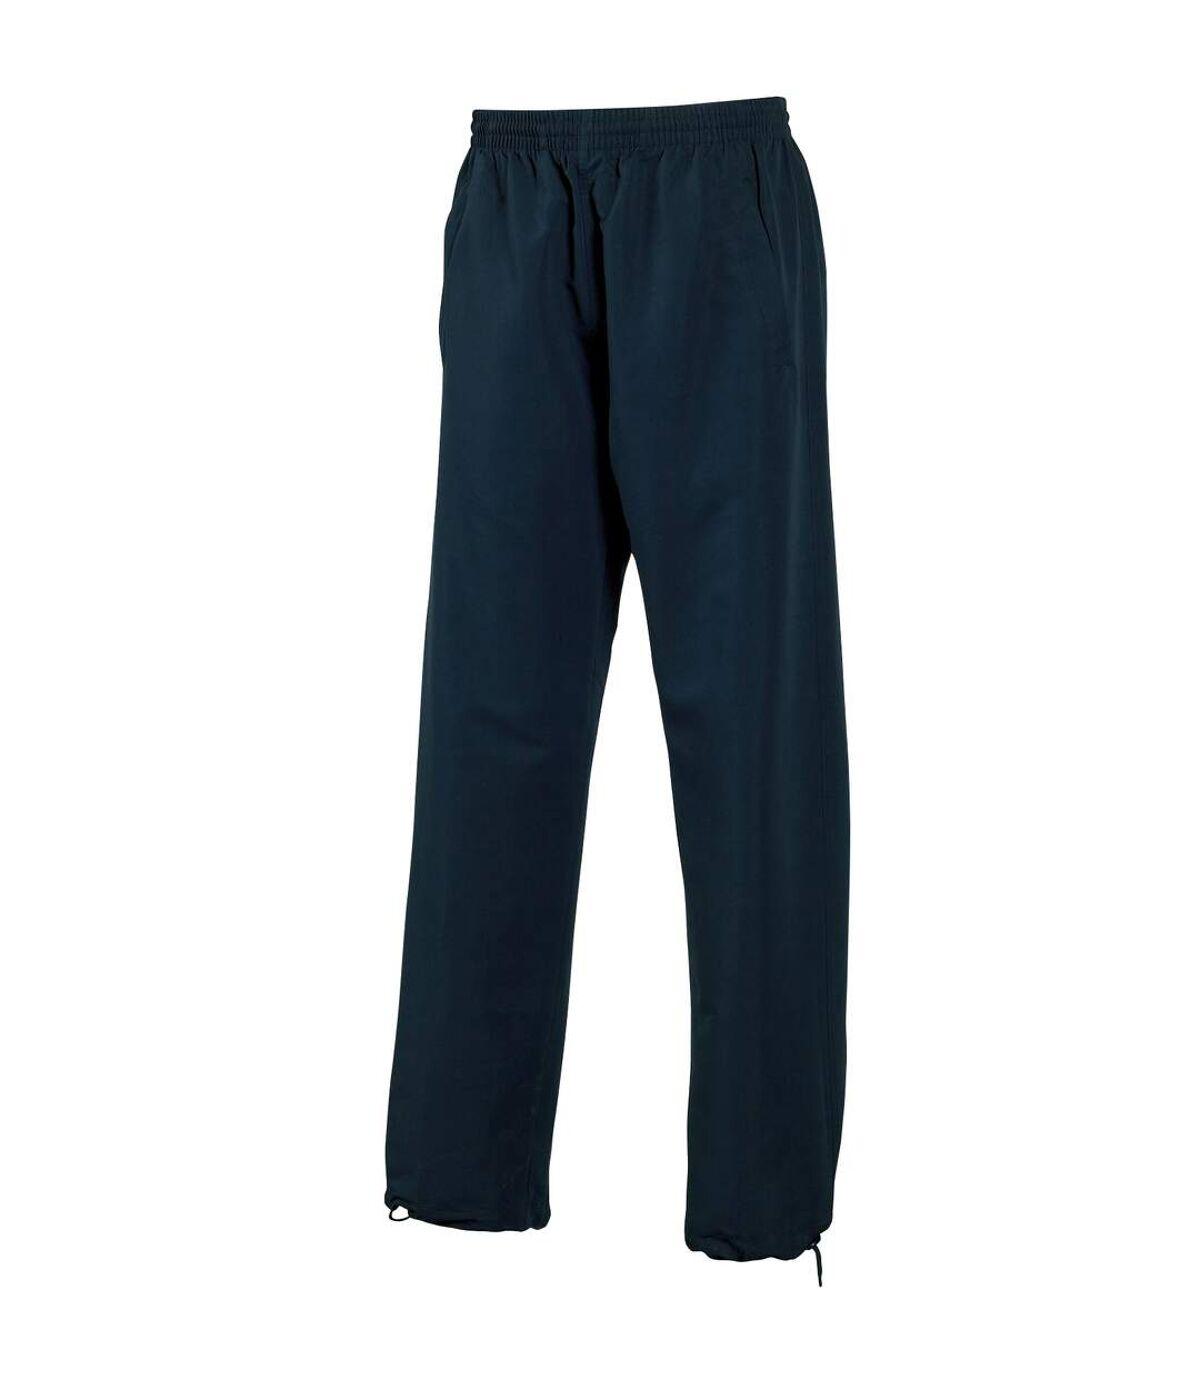 Tombo Teamsport Mens Open Hem Unlined Training Pants / Jogging Bottoms (Navy) - UTRW1529